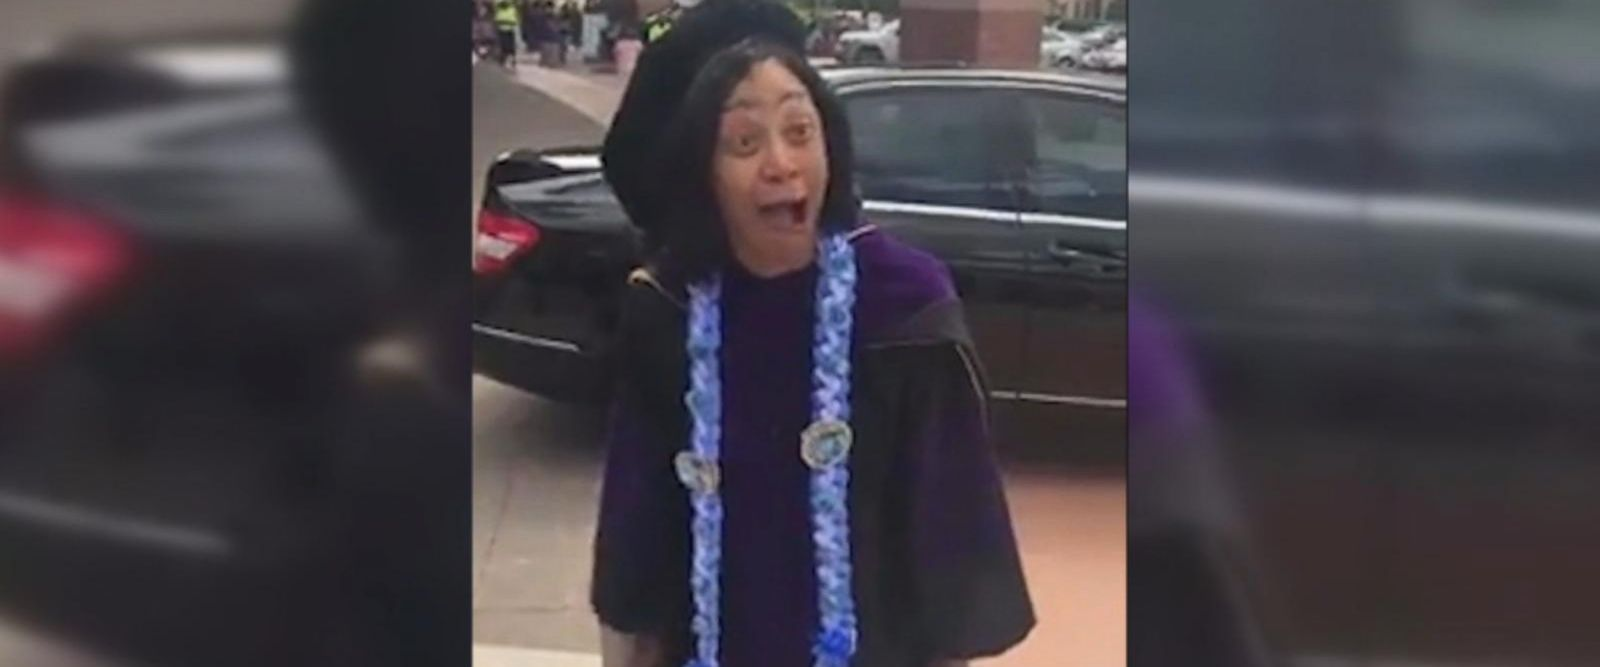 VIDEO: 64-year-old law school graduate gets dream car on graduation day